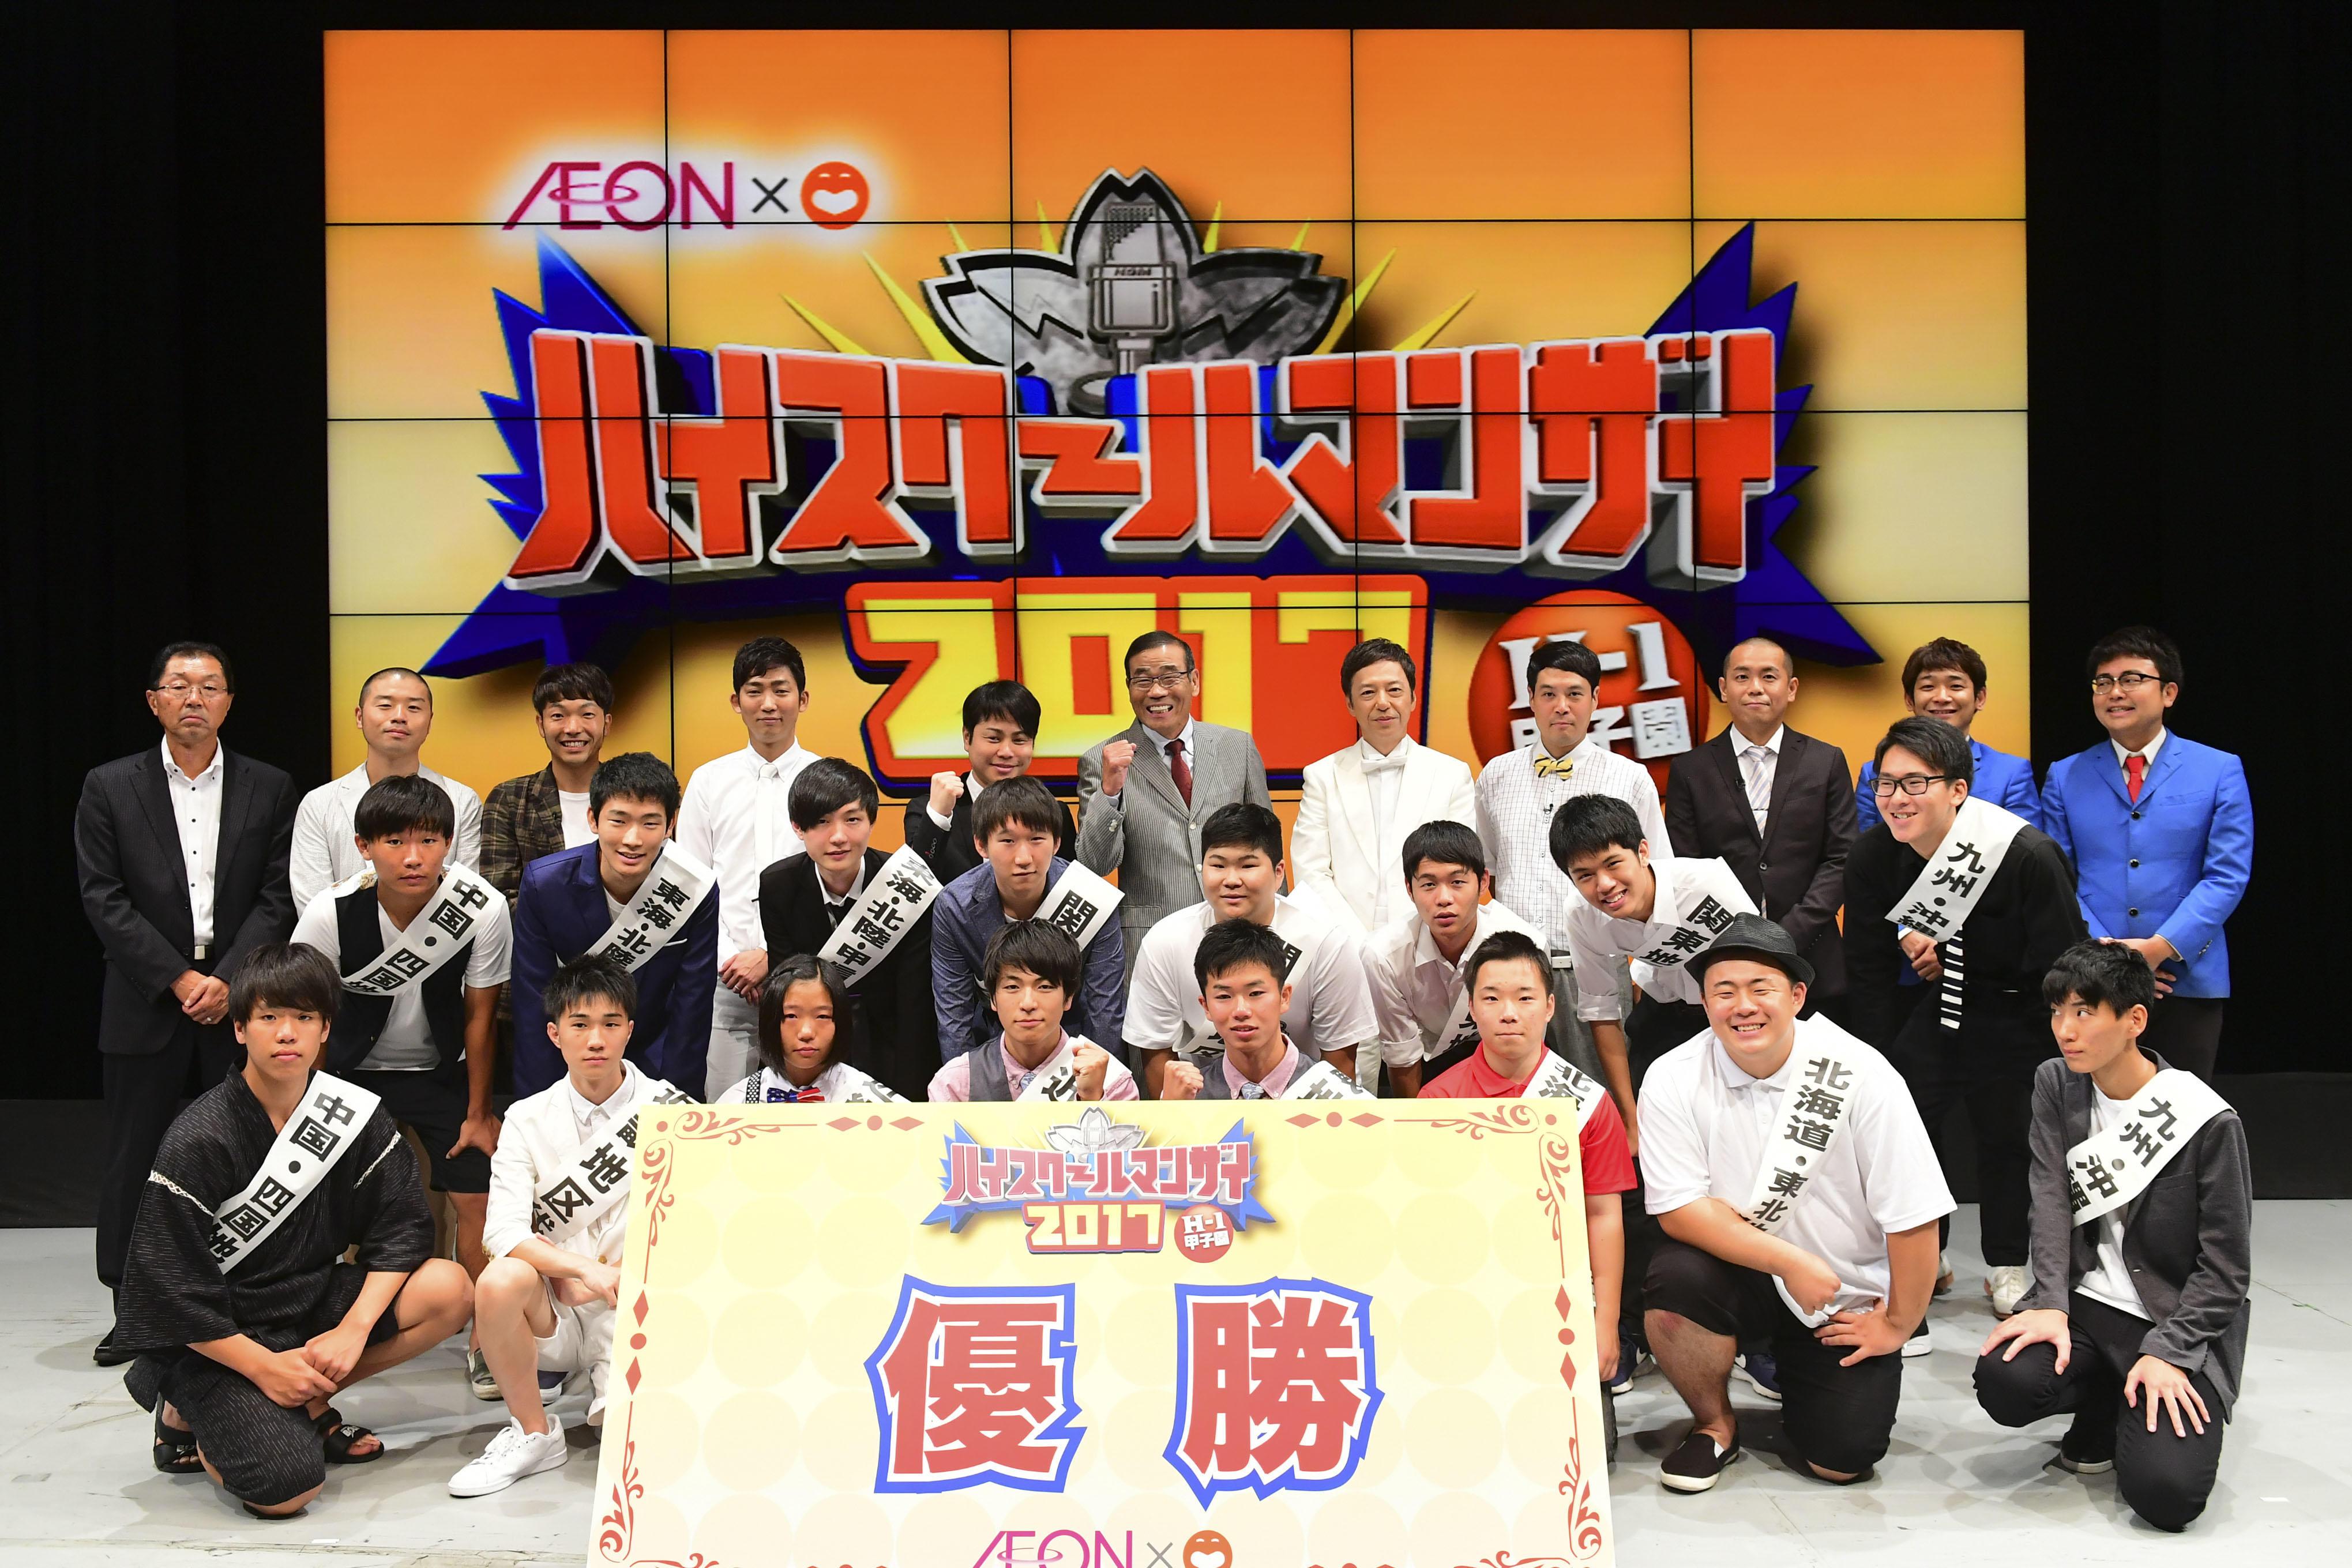 http://news.yoshimoto.co.jp/20170830150121-0ee2ac7fe251196283b716973e4b300e9acbabac.jpg